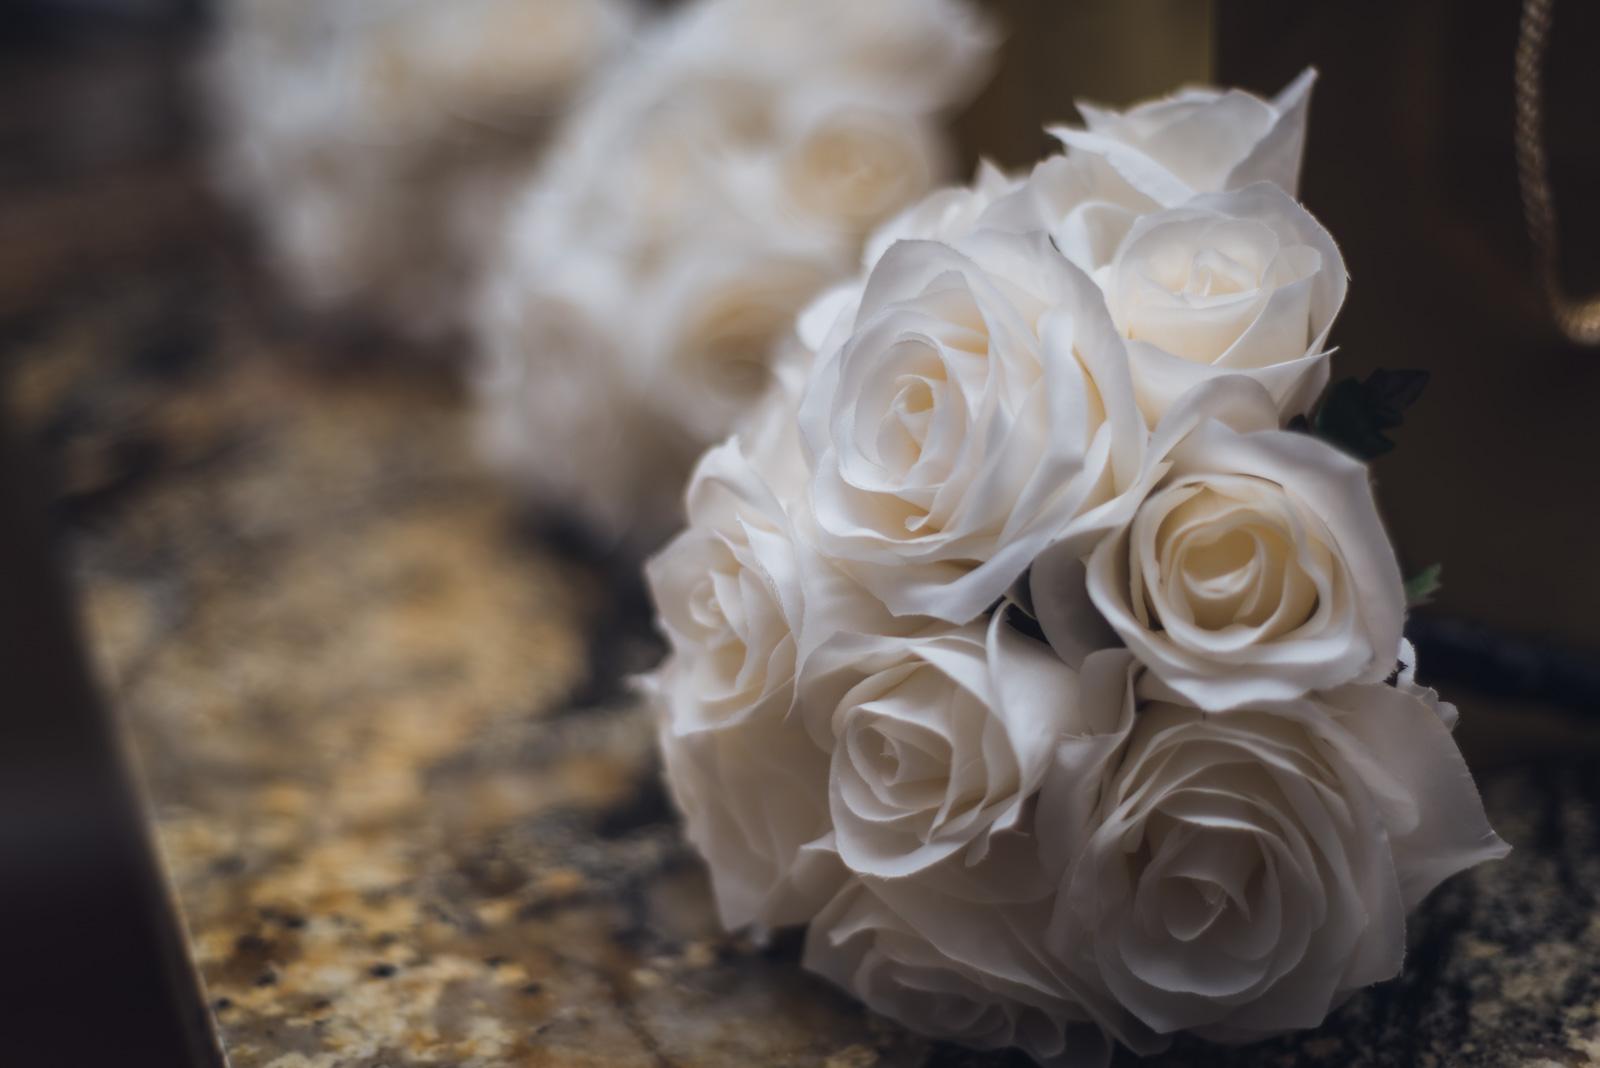 rheana-chris-wedding-blog-45.jpg